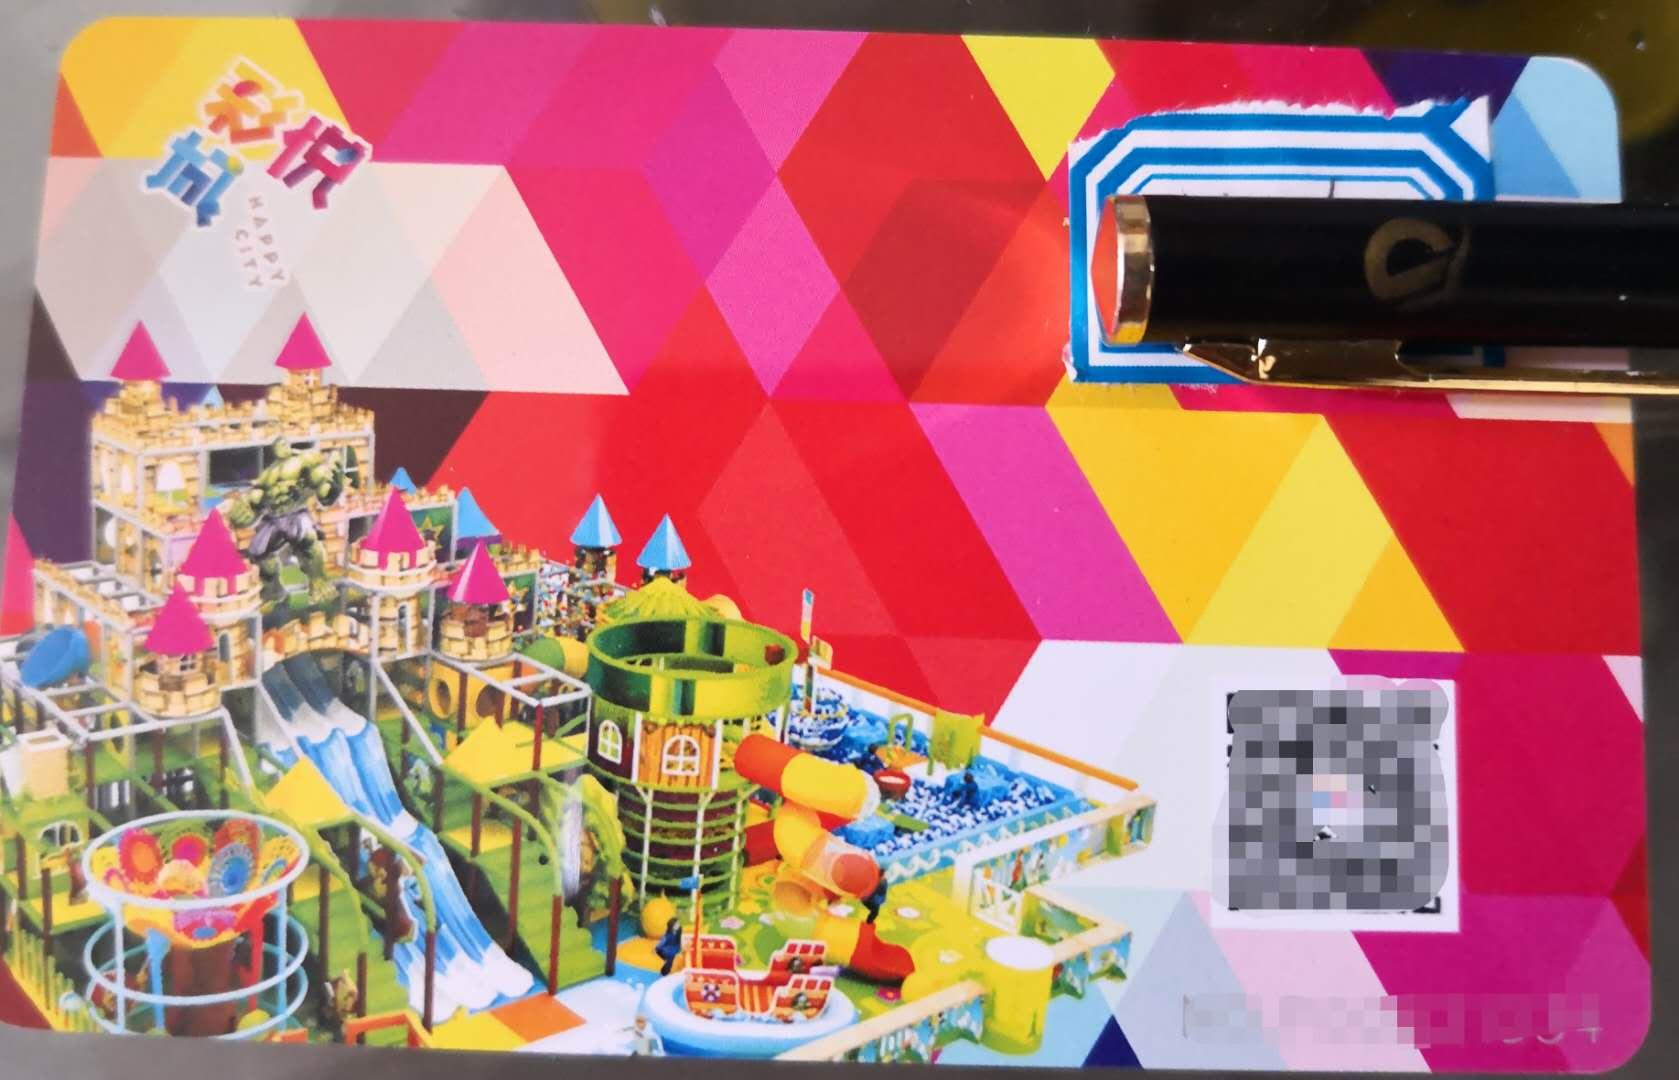 Тяньцзинь цвет Yuecheng Point Card 345 юаней 650 пунктов